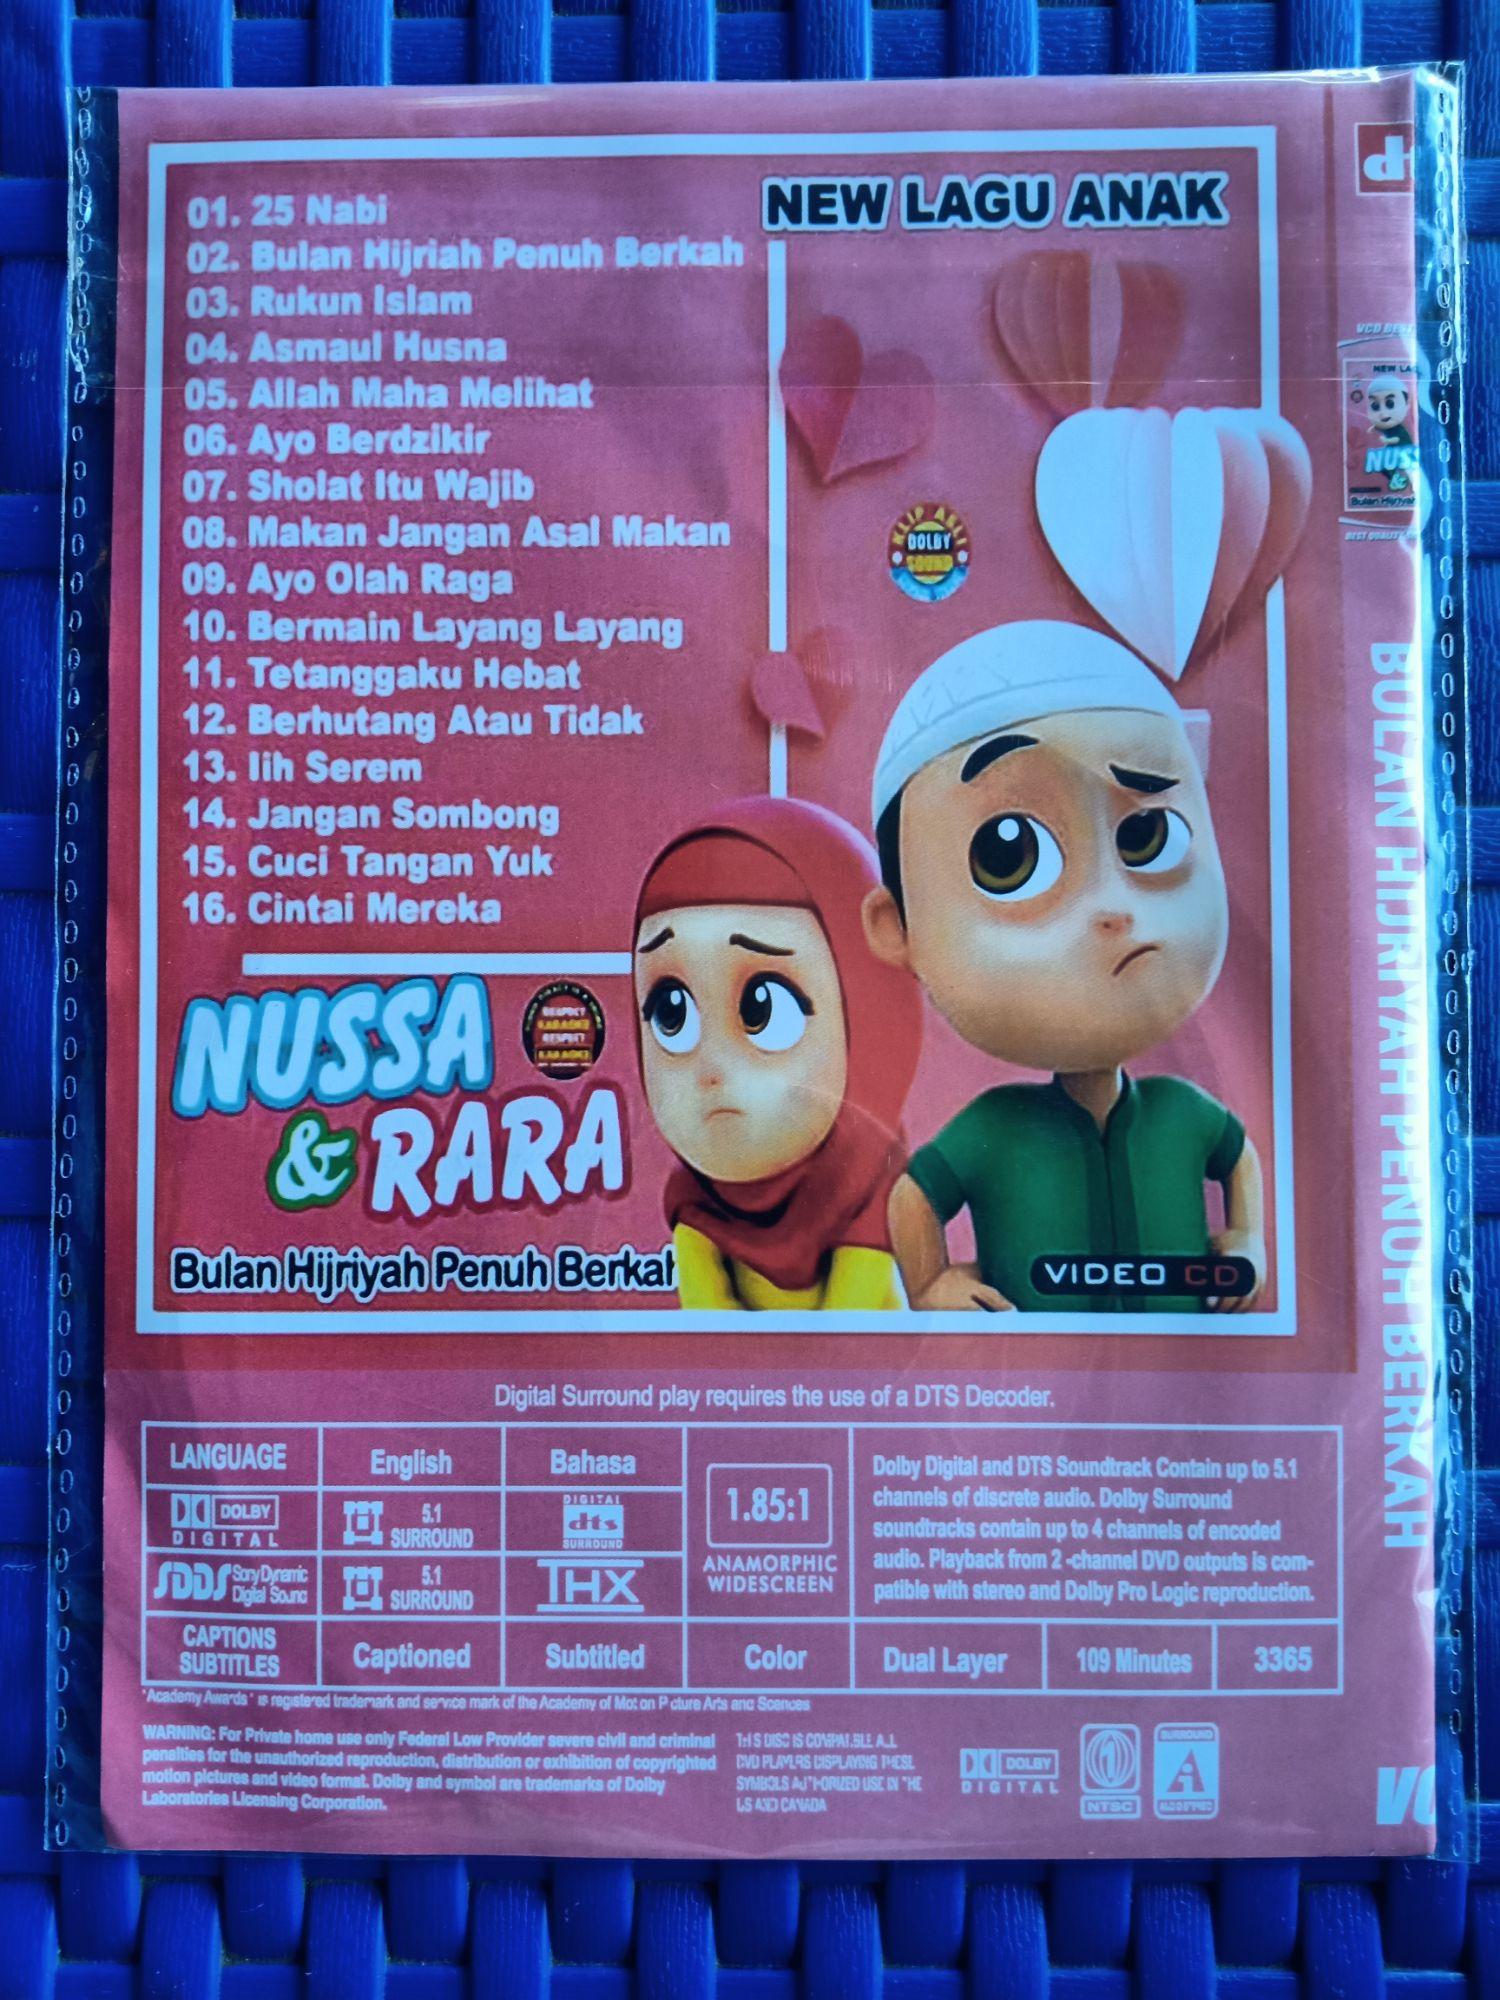 KASET VIDEO CD DVD LAGU ANAK ANAK TERBARU NUSA & RARA   Lazada ...